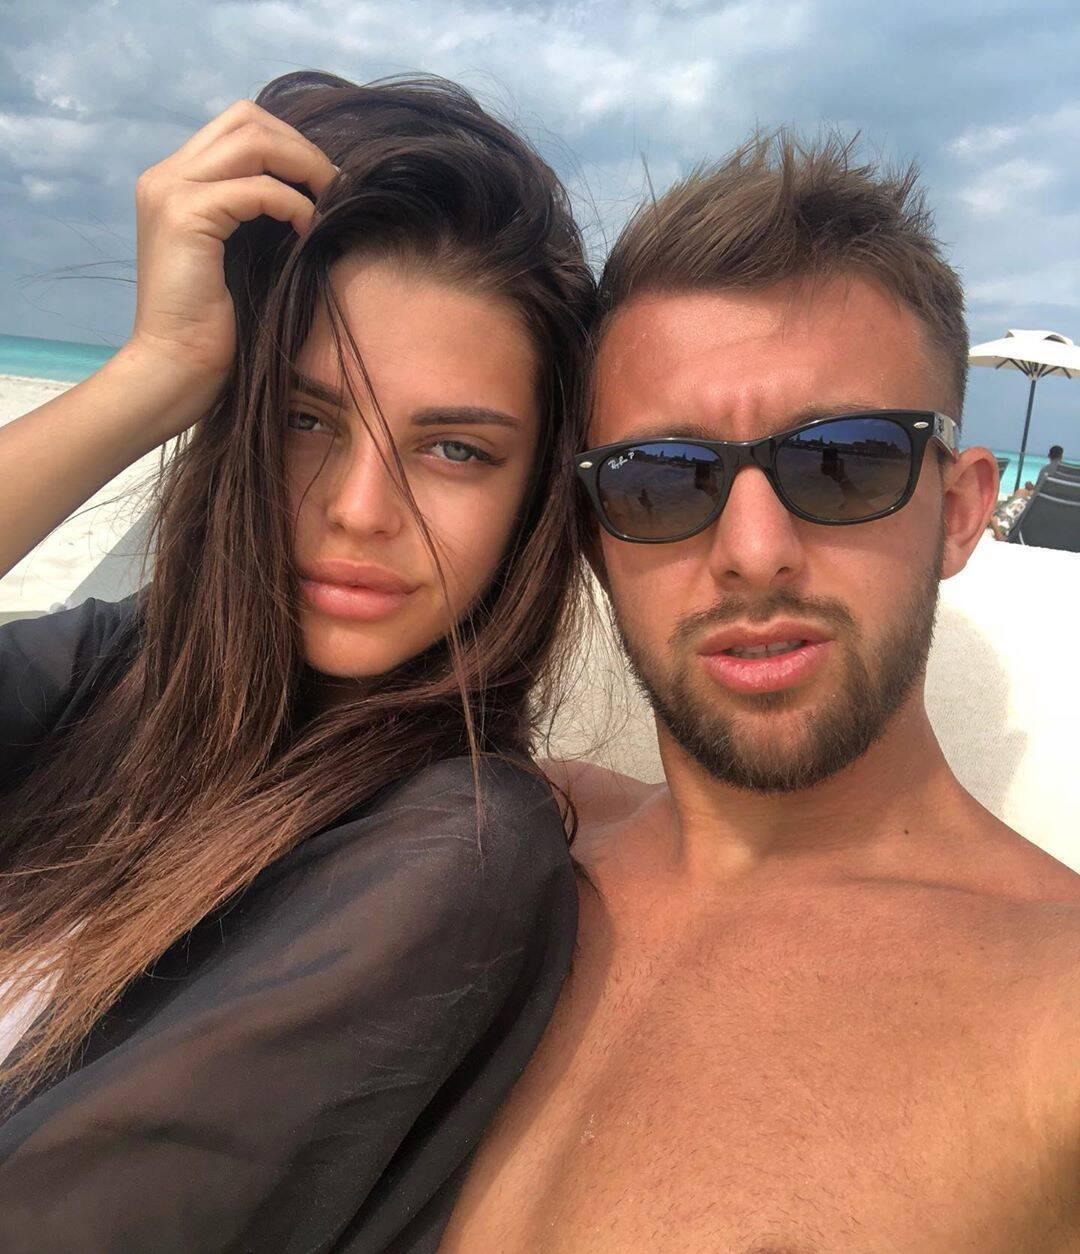 Владлен и Кристина вместе на отдыхе